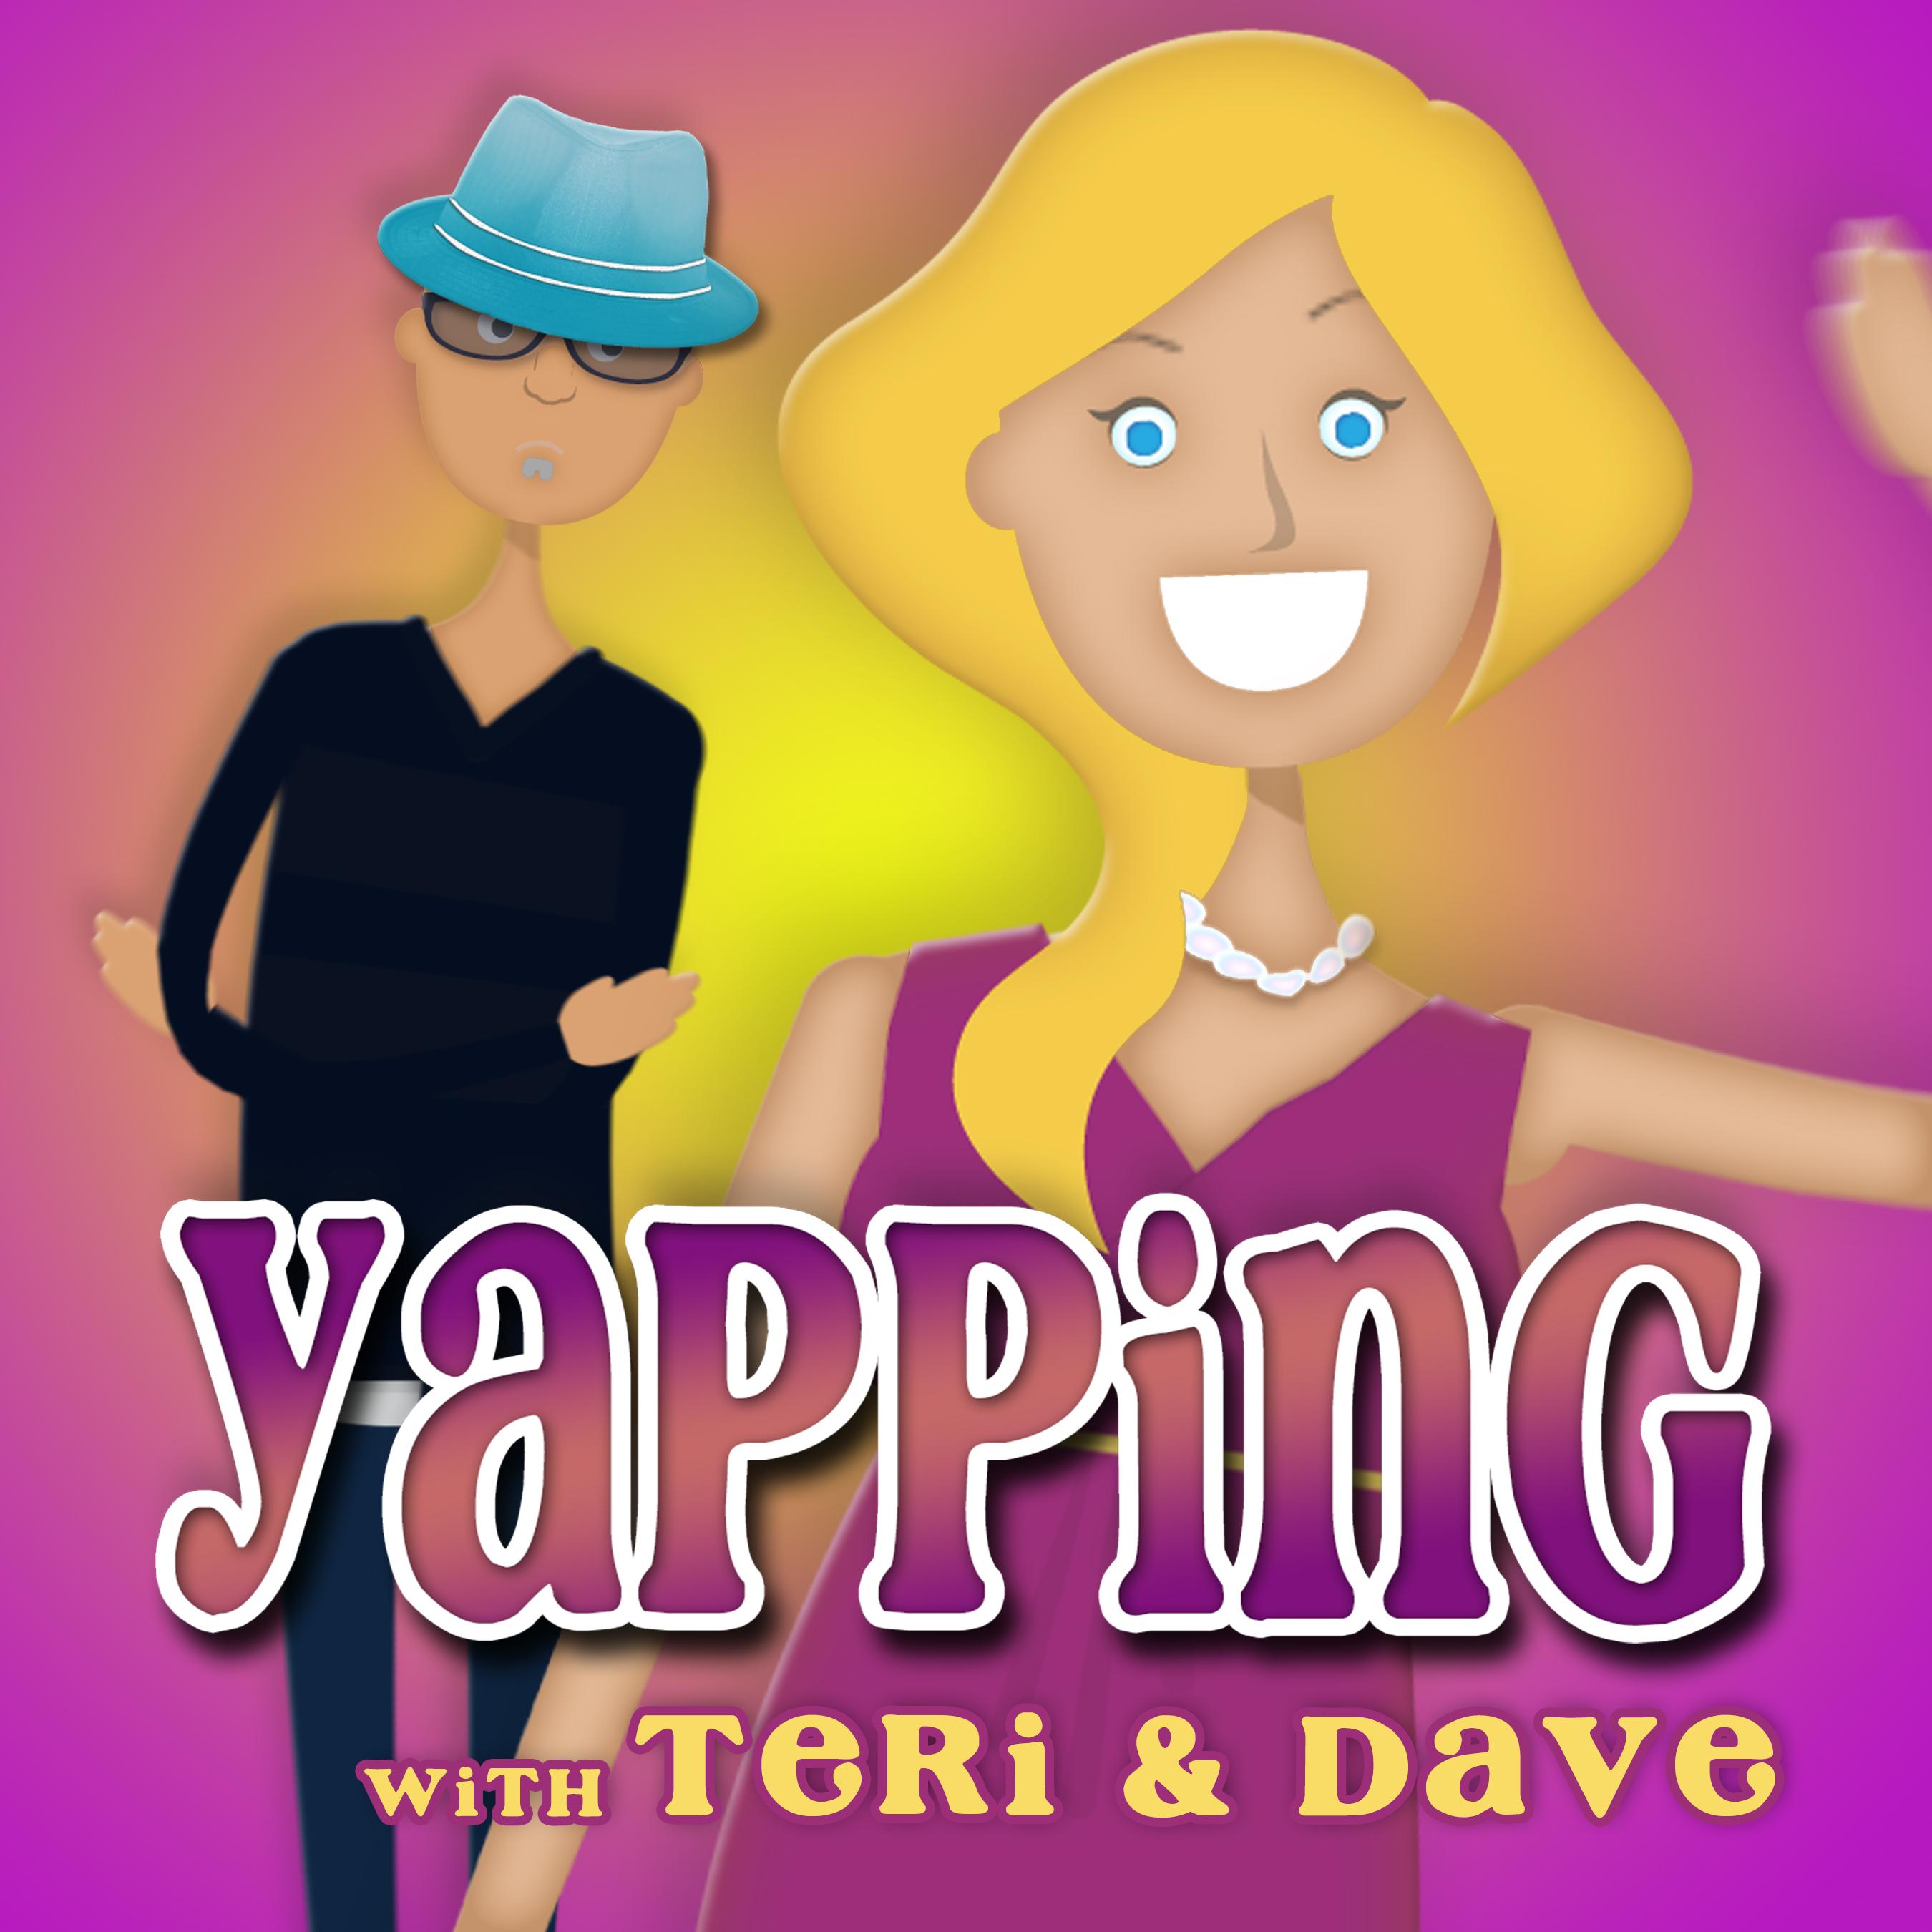 yappping-pod-cvr